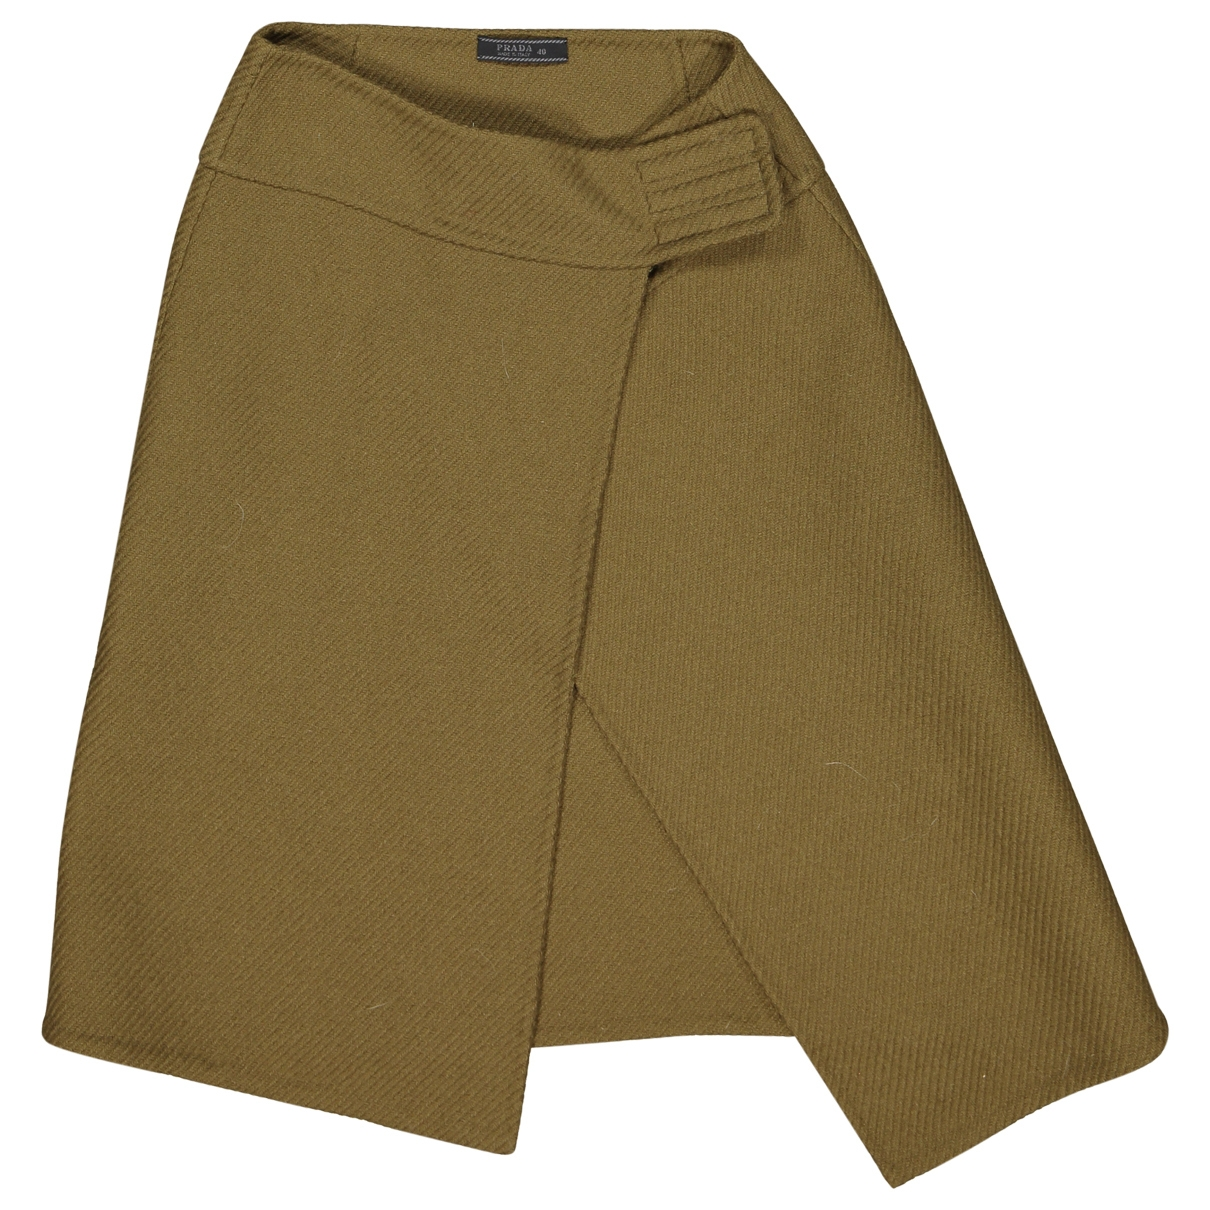 Prada \N Khaki Wool skirt for Women 40 IT